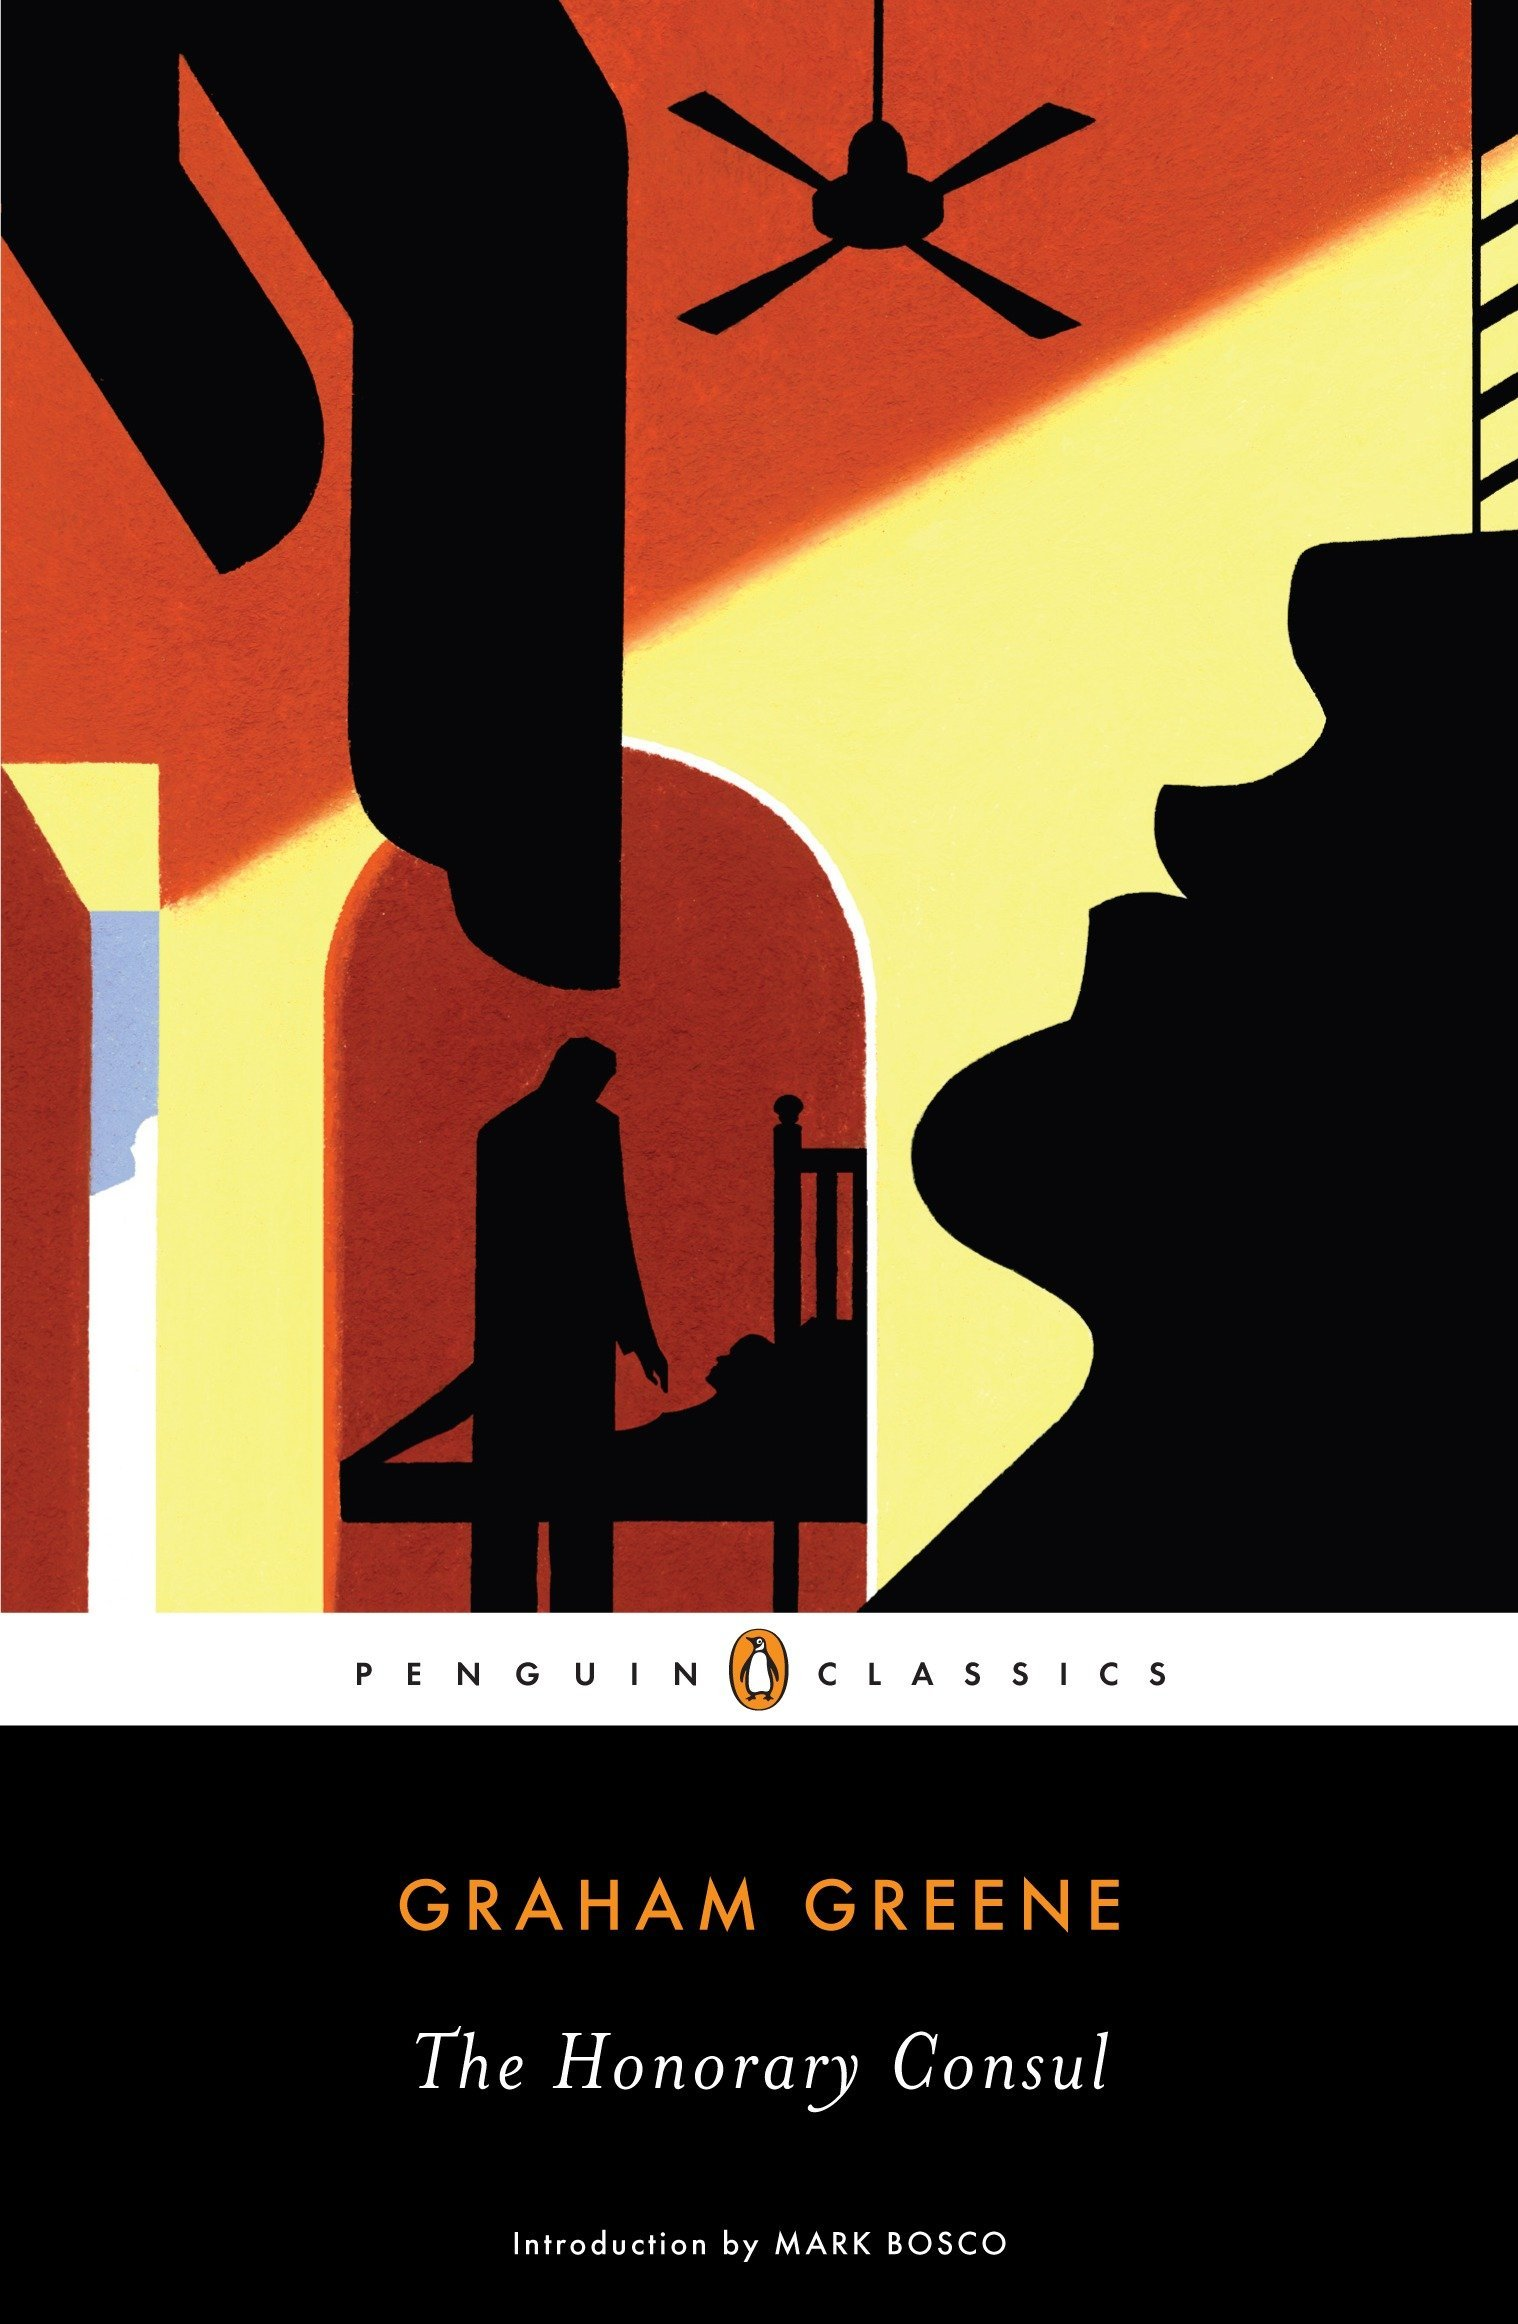 The Honorary Consul (Penguin Classics): Amazon.es: Graham Greene: Libros en idiomas extranjeros